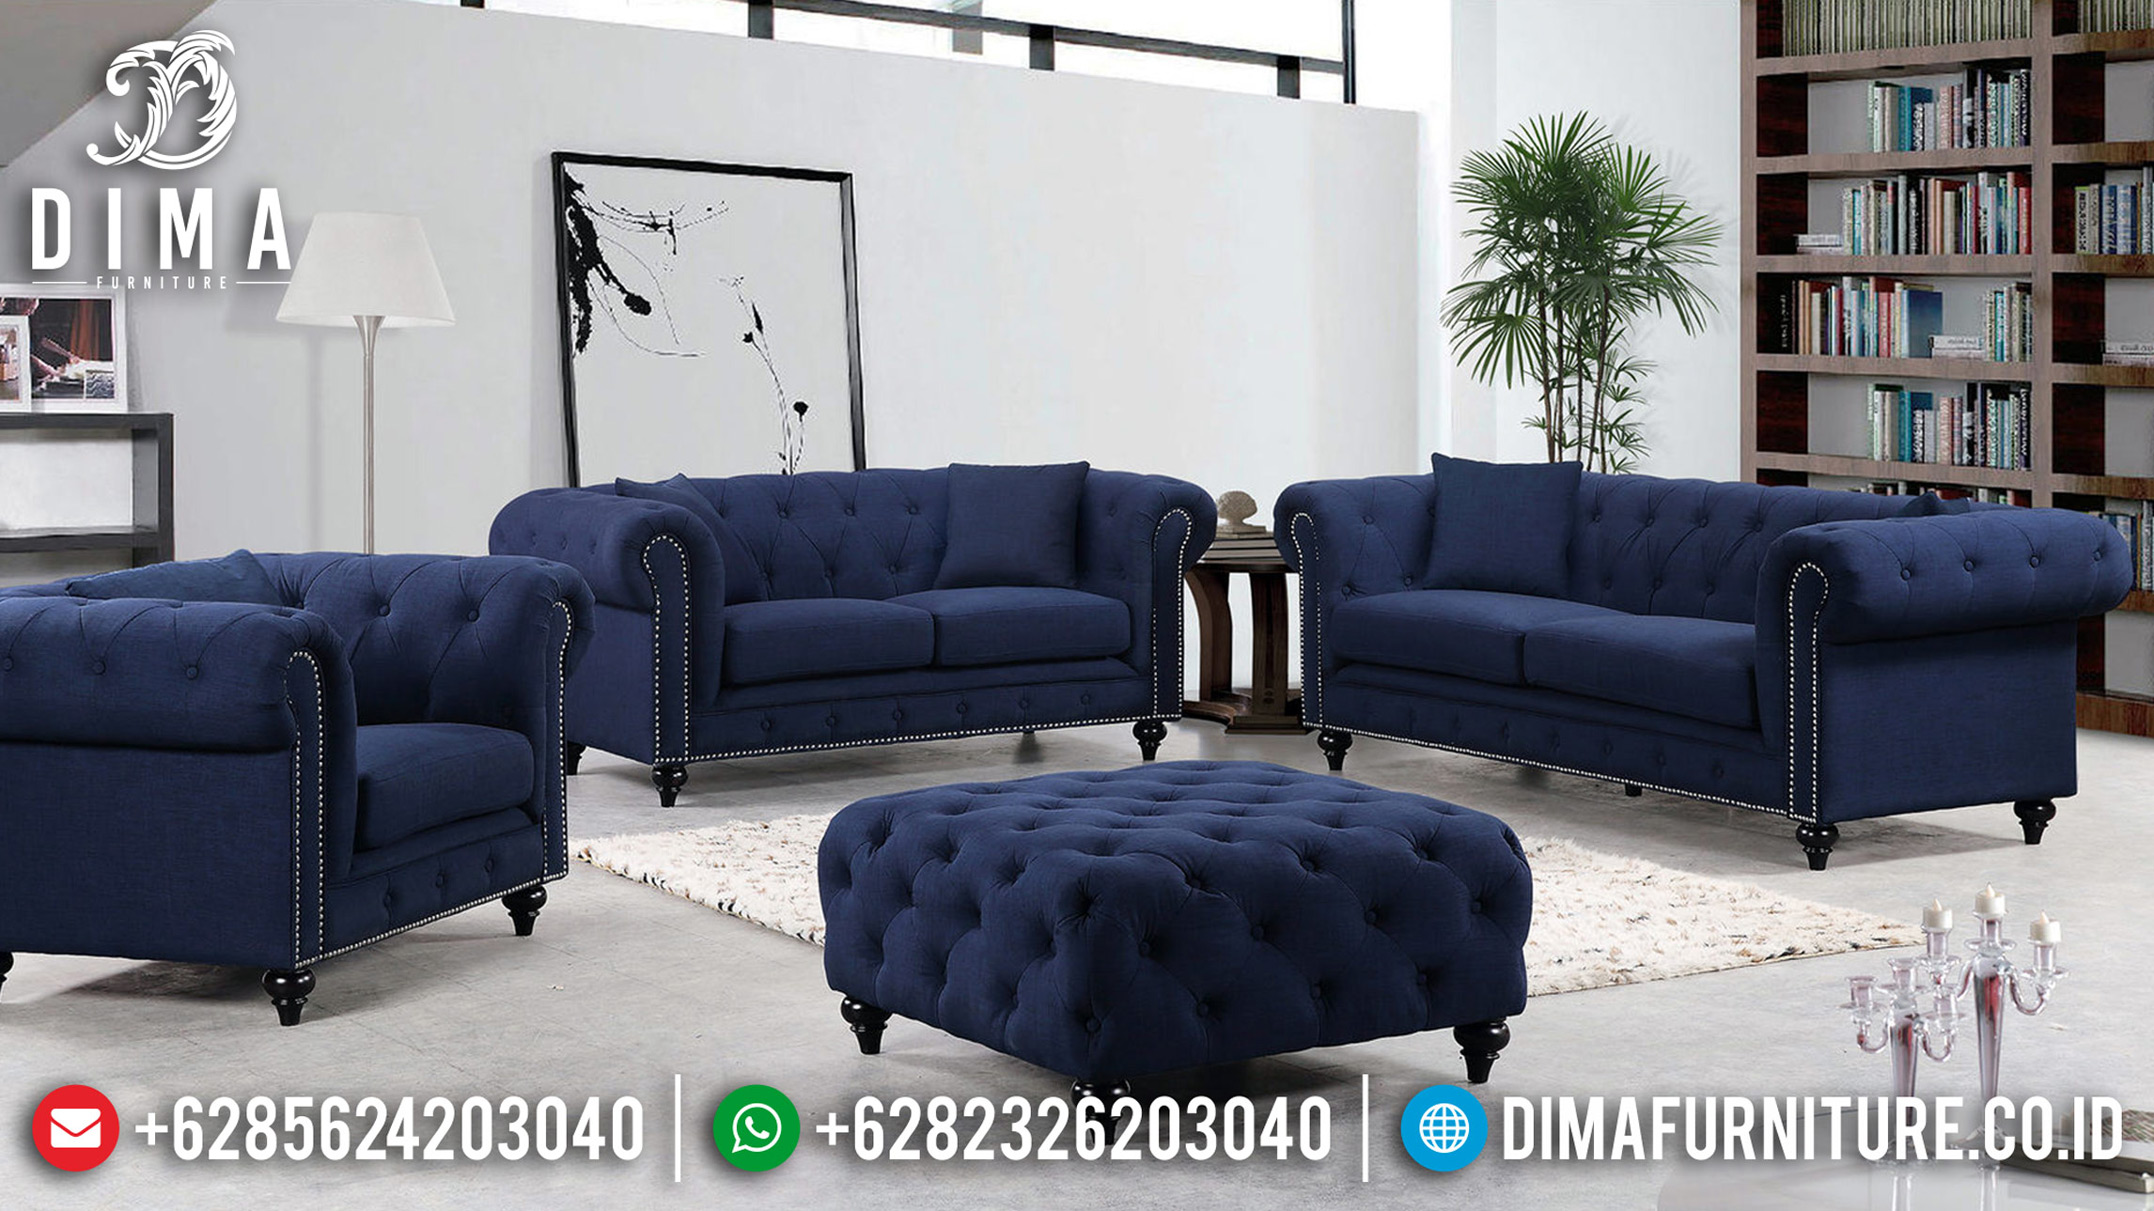 Harga Sofa Tamu Minimalis Jepara New Style Kayu Jati Perhutani BT-0661